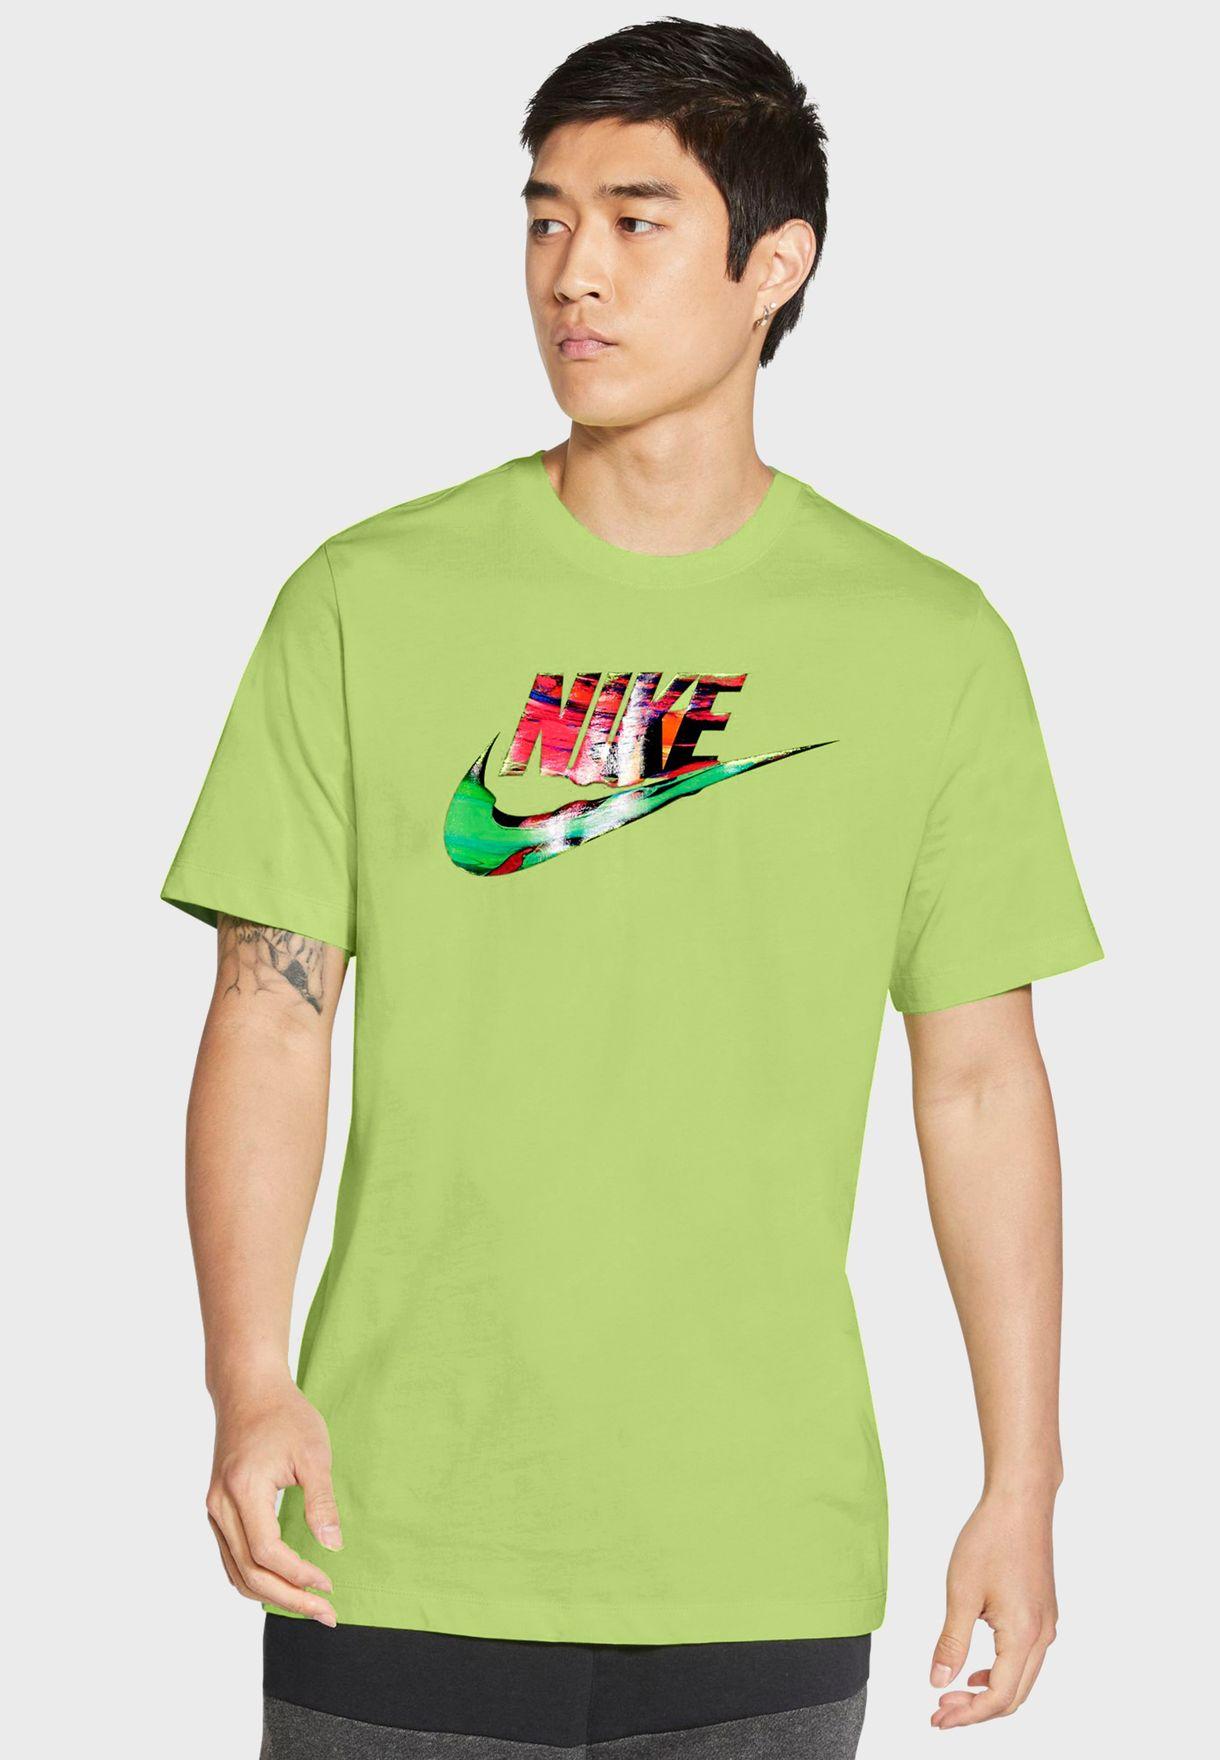 NSW Spring Break T-Shirt